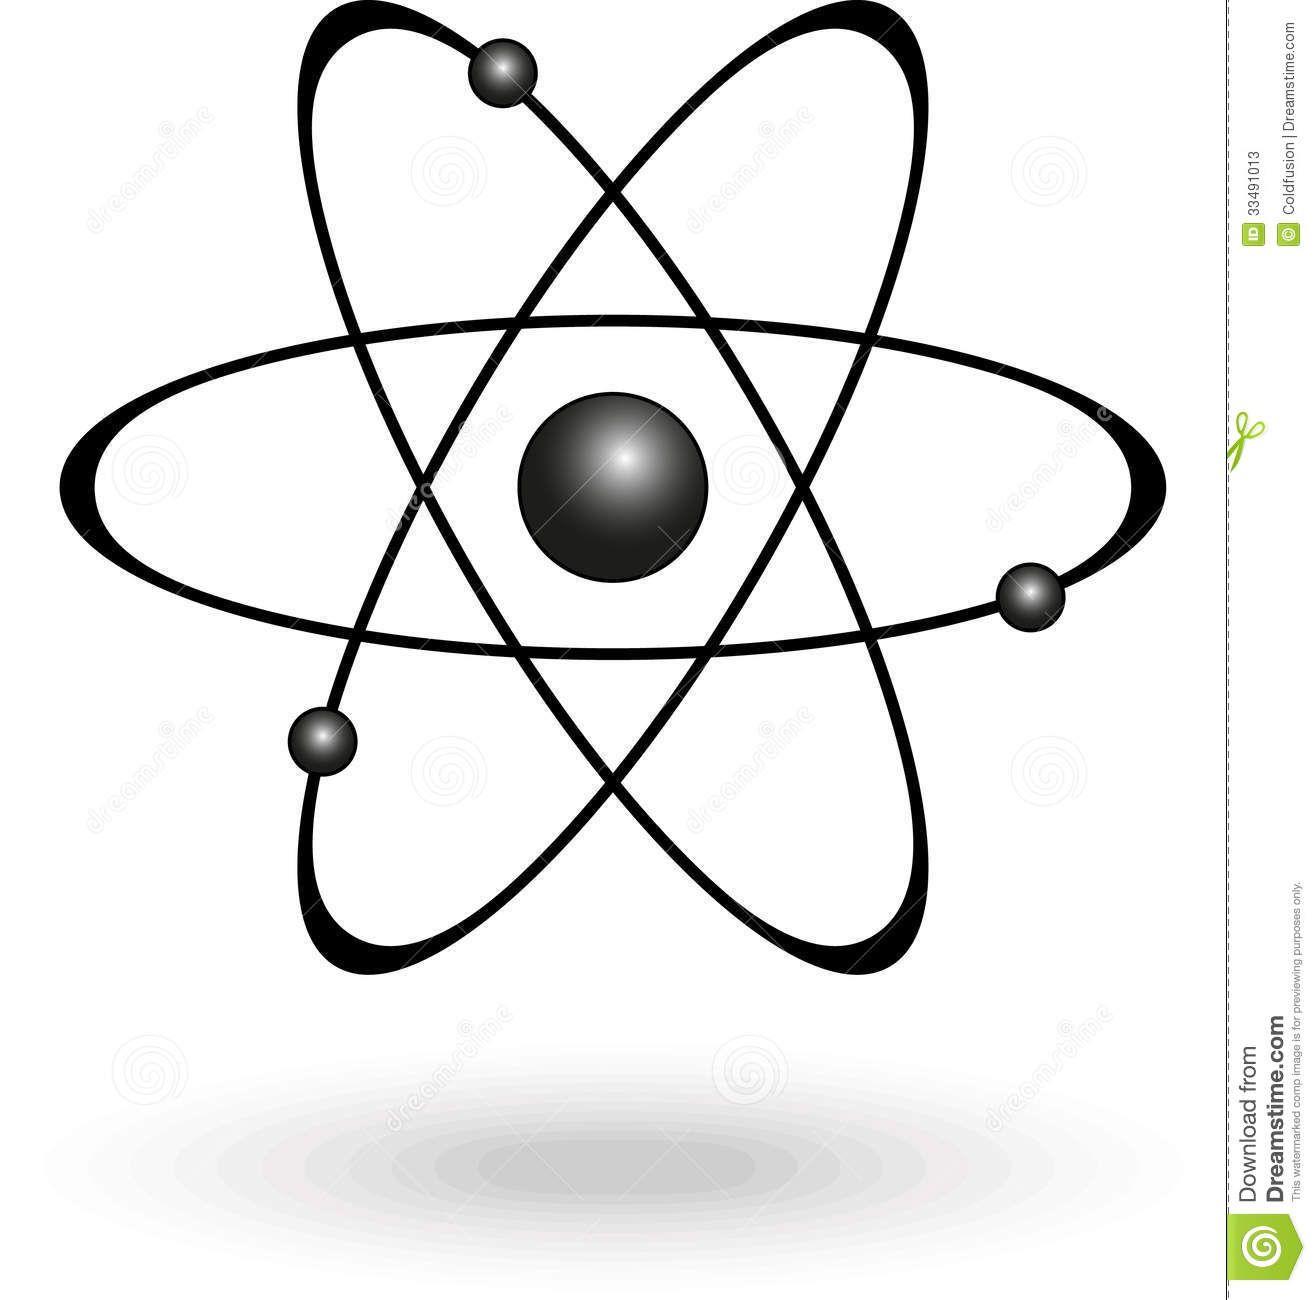 neutron energy symbols atom symbols neutron energy symbols atom symbols